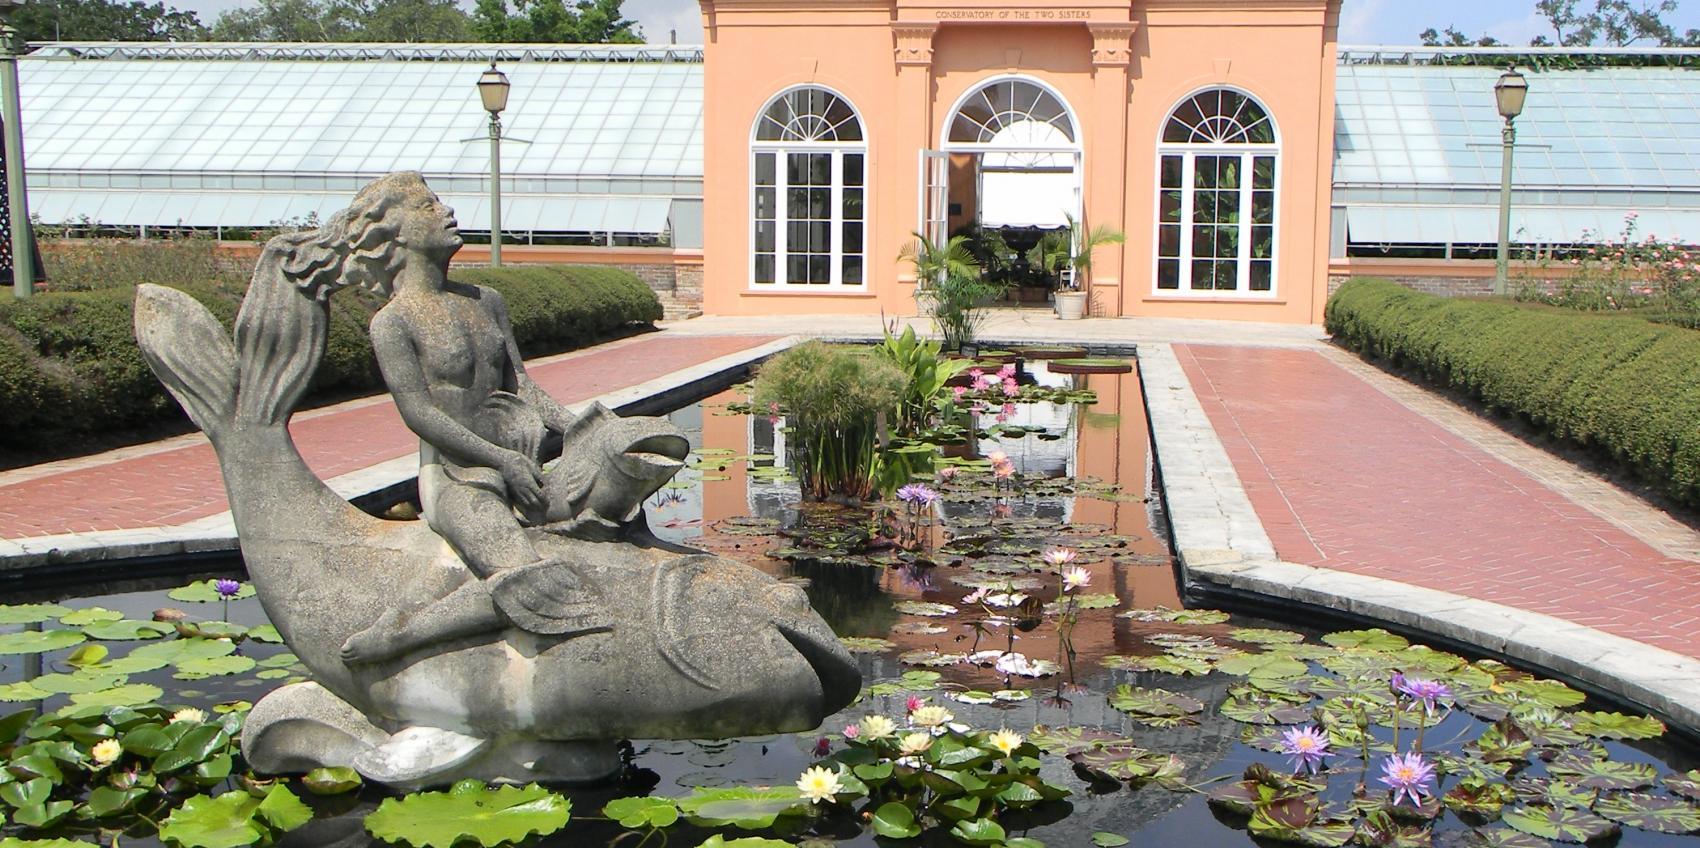 New Orleans Botanical Garden American Public Gardens Association